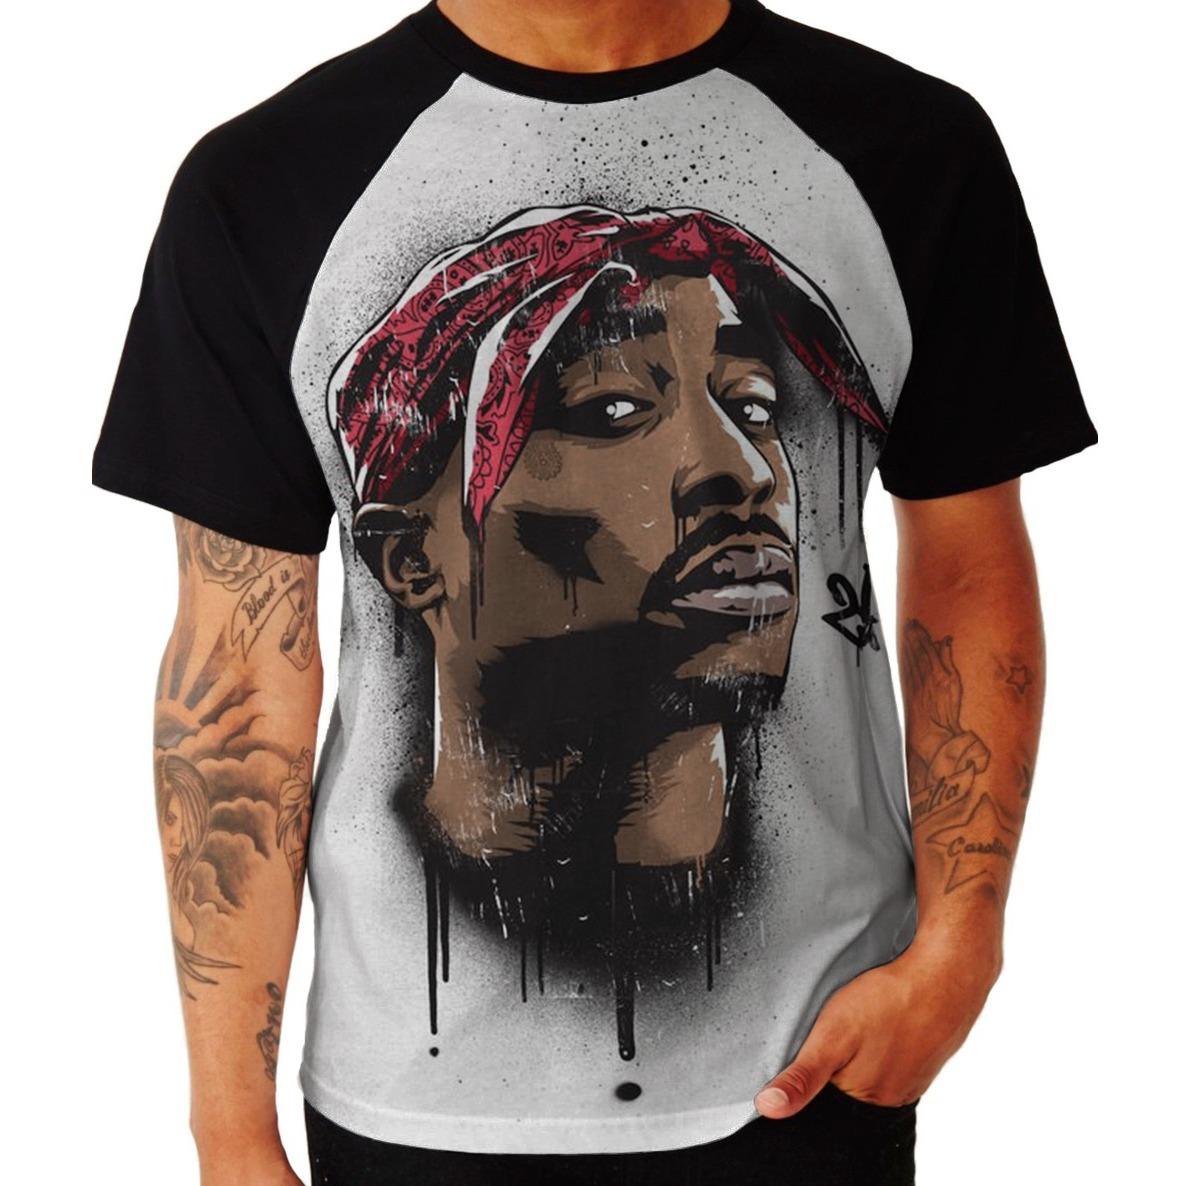 95cab574fd03b camisa camiseta tupac shakur 2pac rap hip hop mc batalha top. Carregando  zoom.